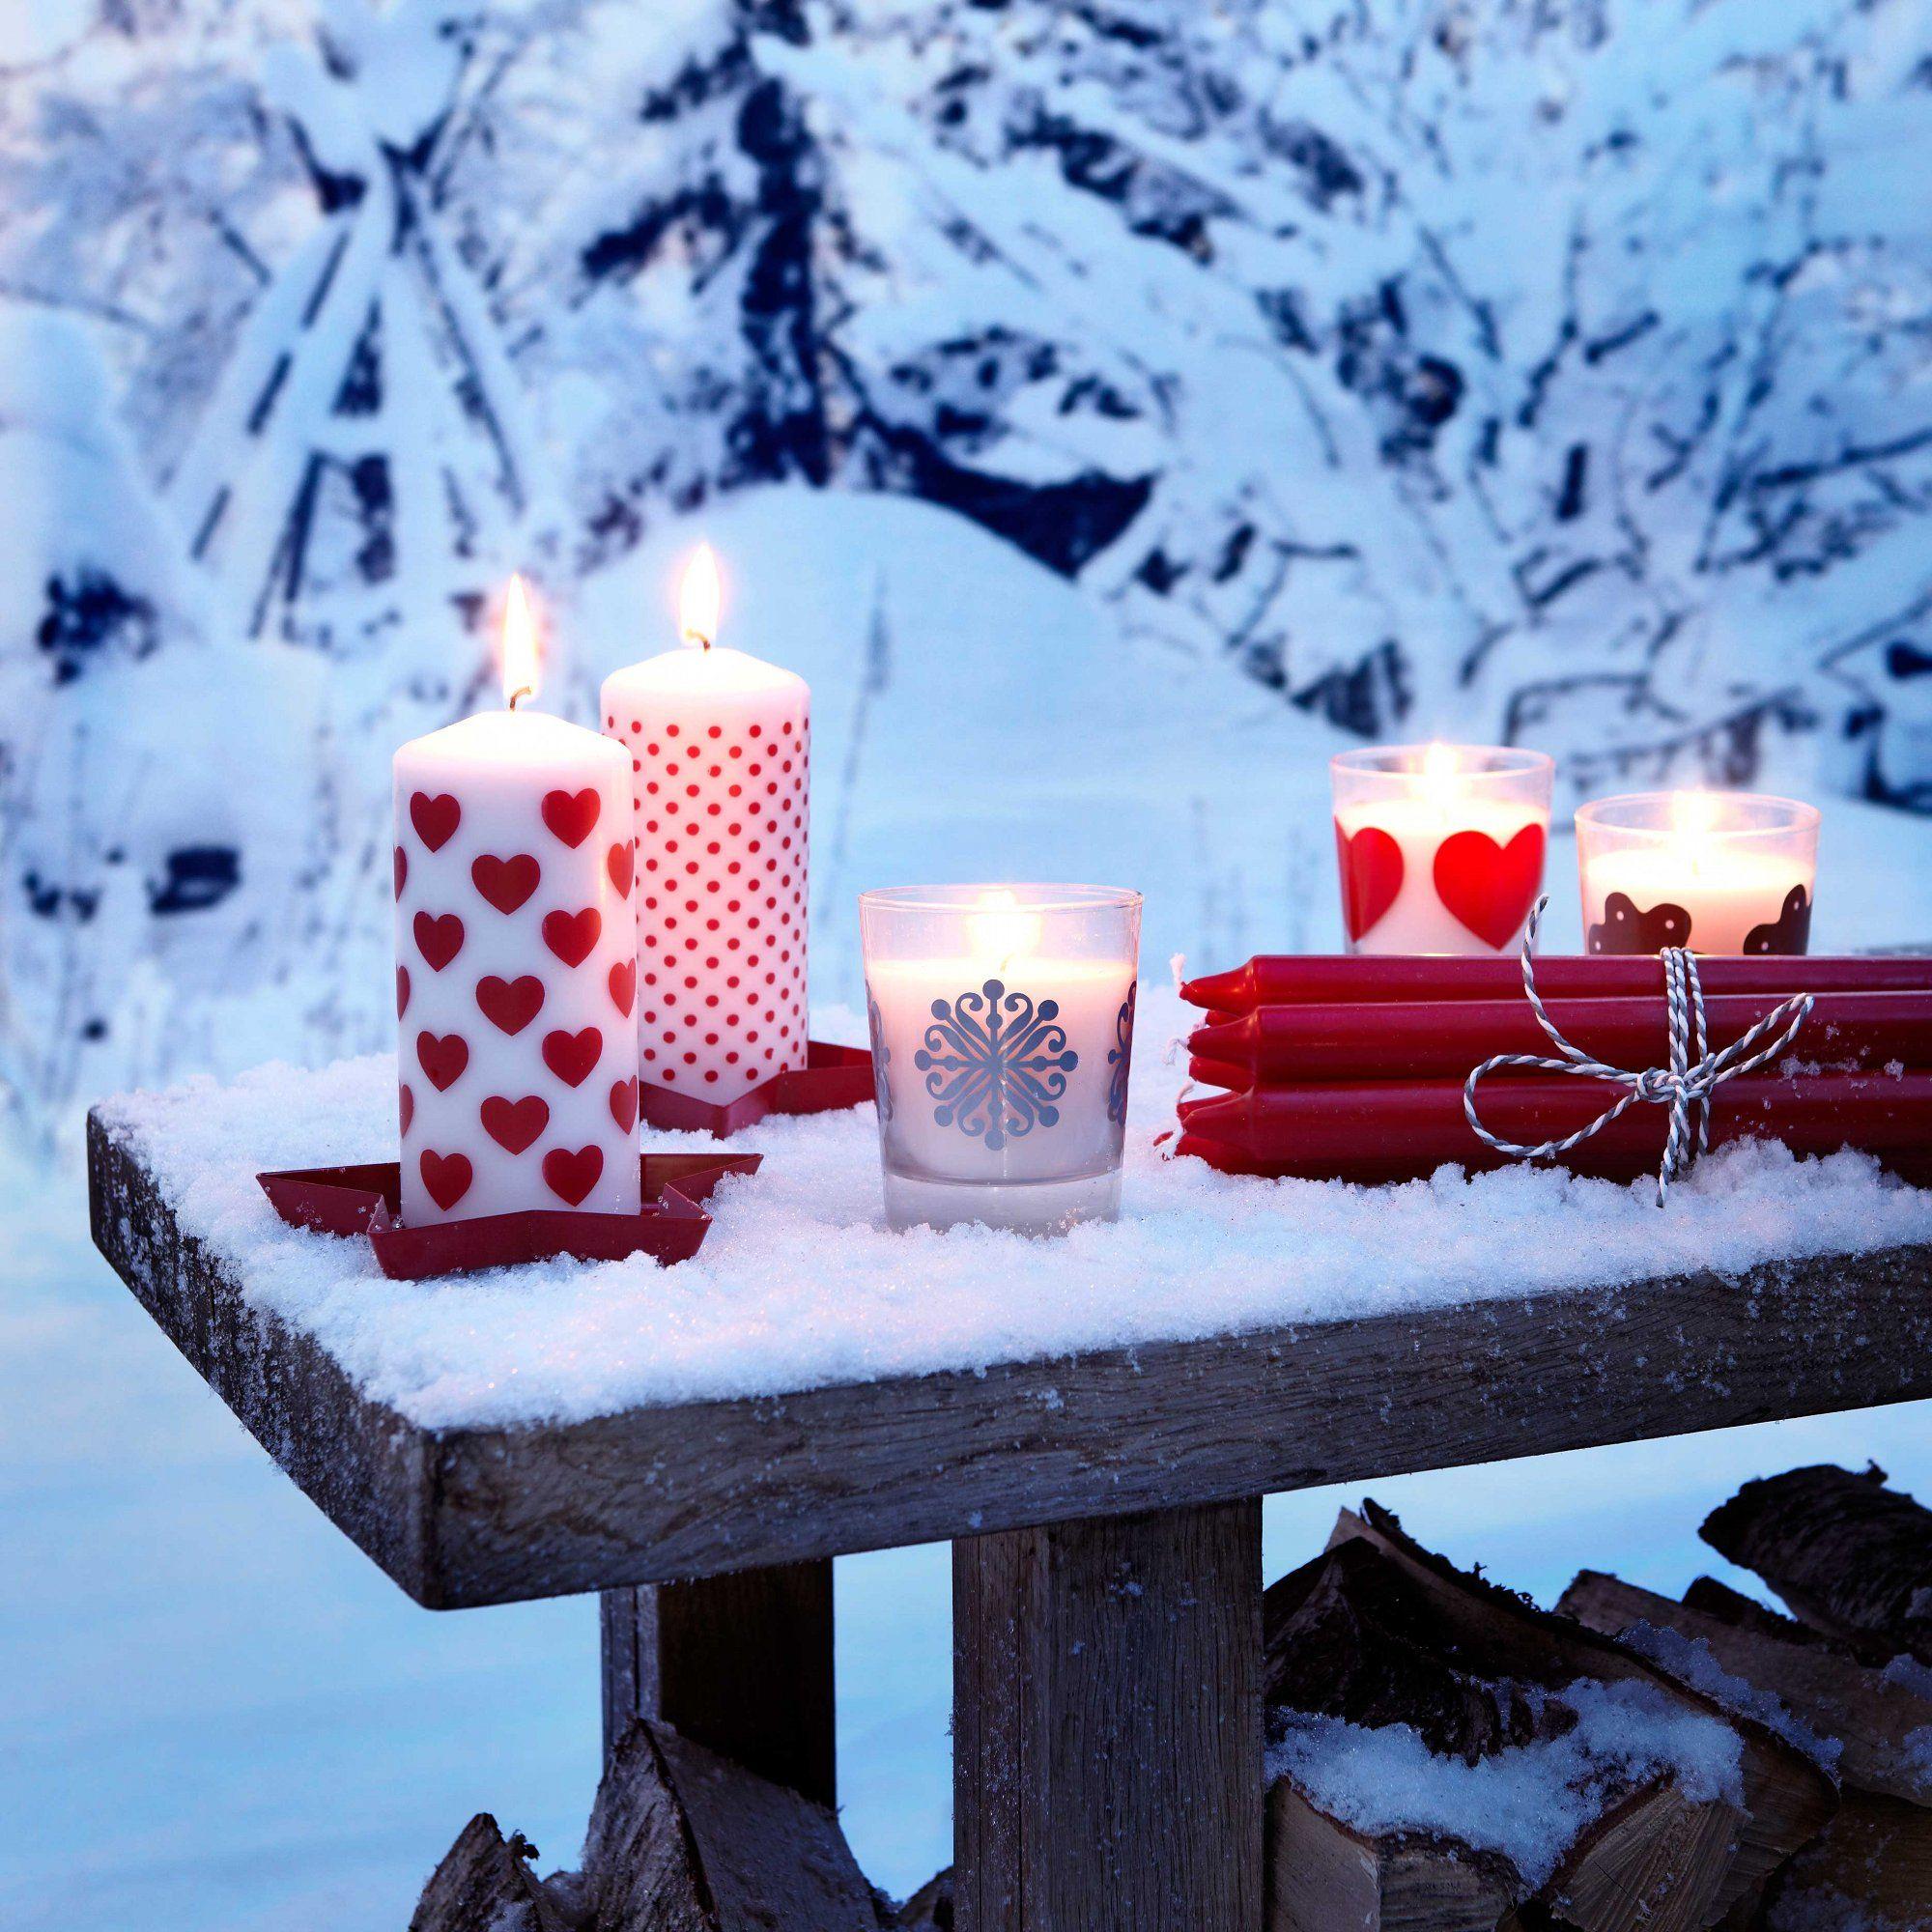 Weihnachtsdeko Inspiration.Weihnachten Bei Feel The Winter Holiday Candles Christmas